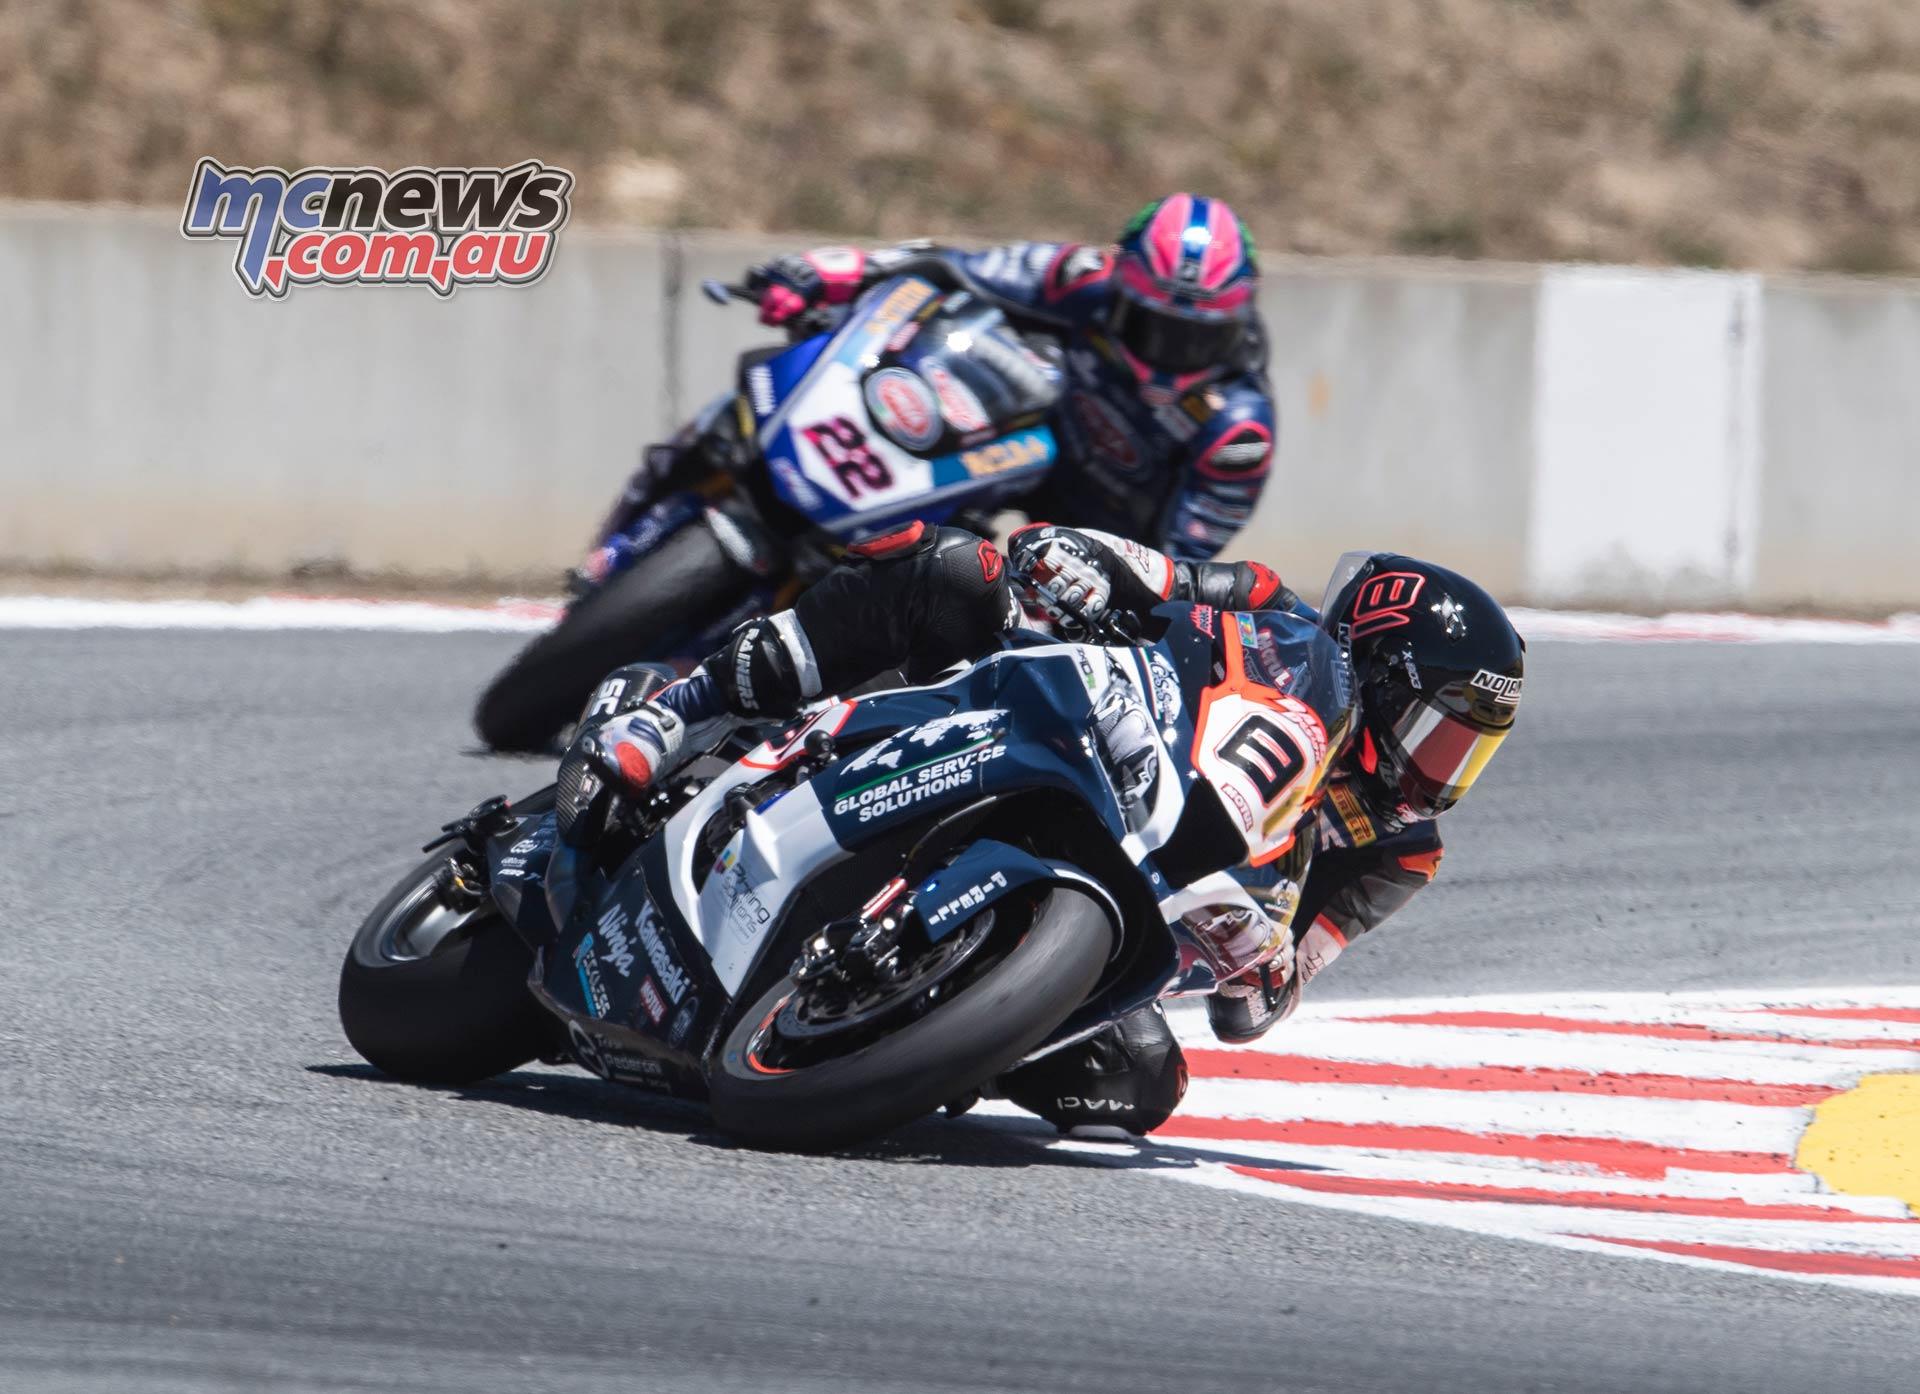 WSBK Rnd LagunaSeca Race Torres Lowes